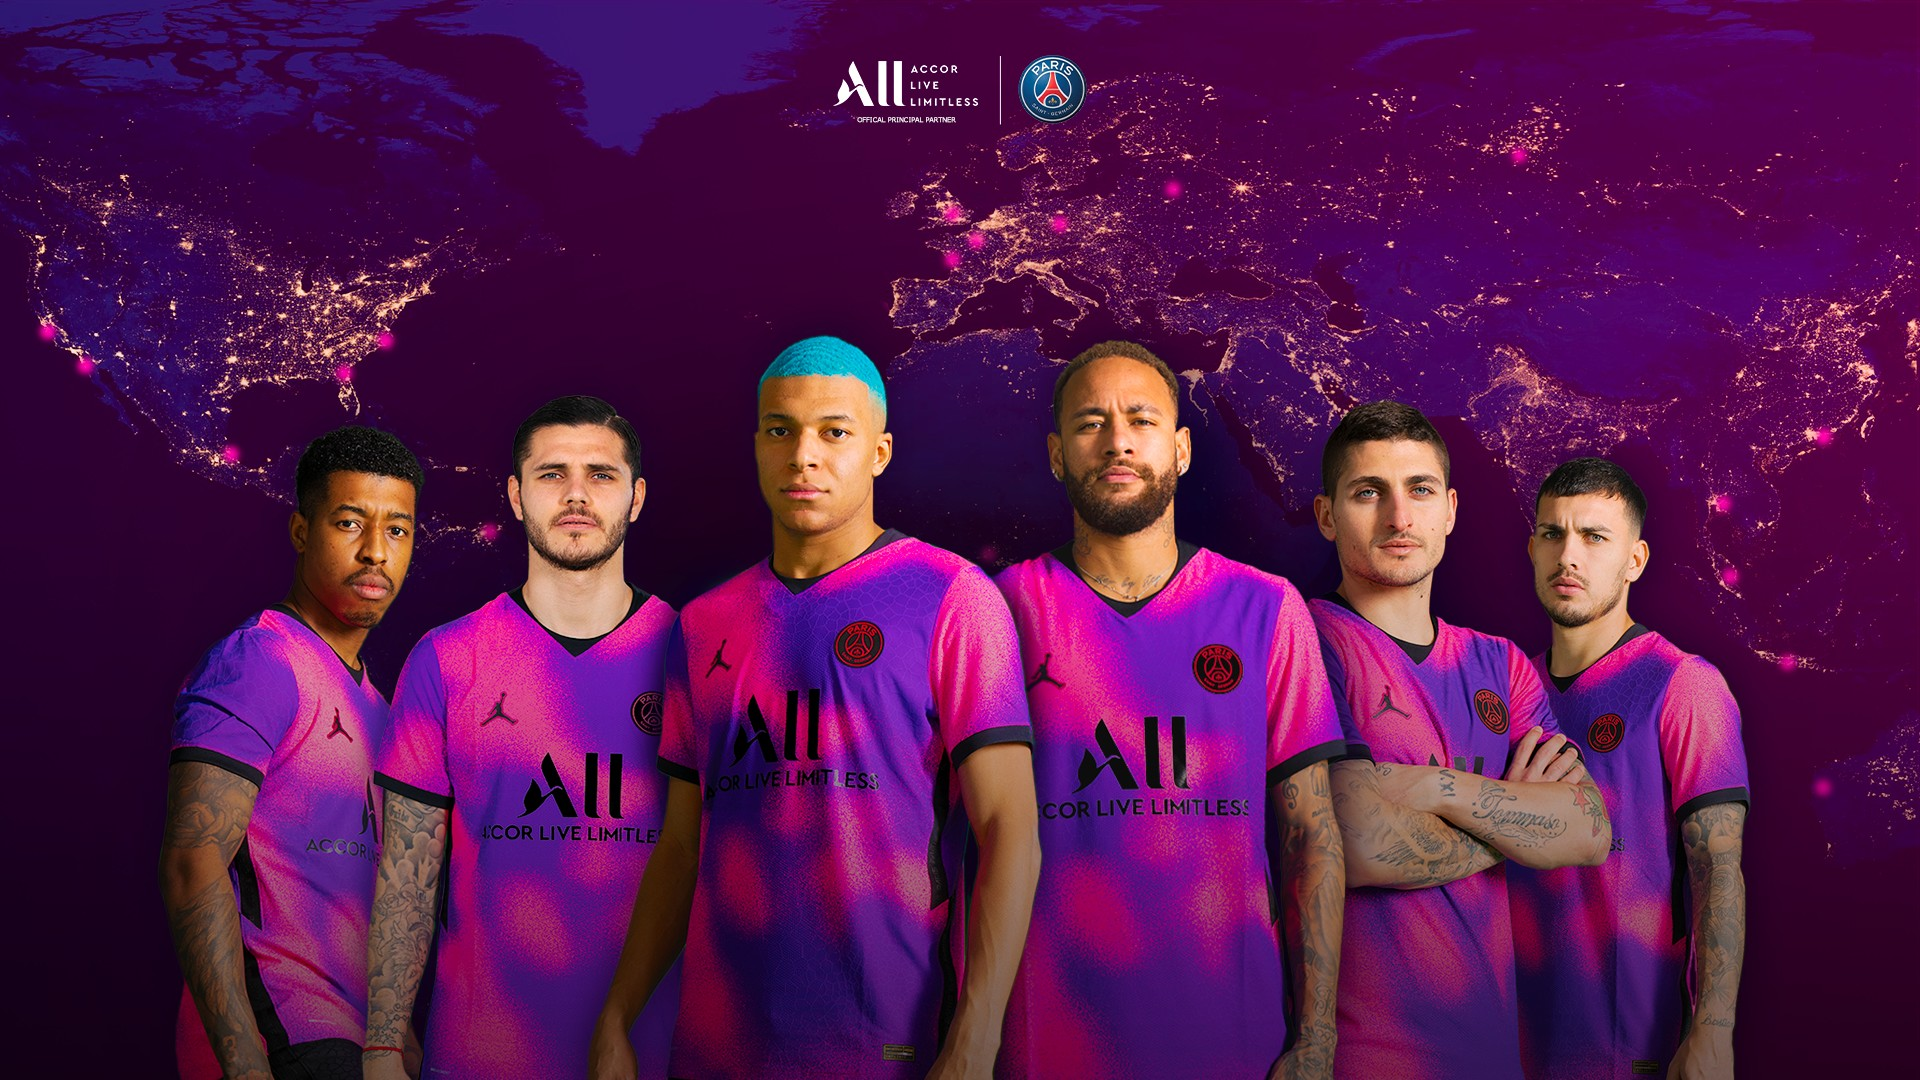 Accor x Paris Saint Germain (football) Opé theALLjourney 2021